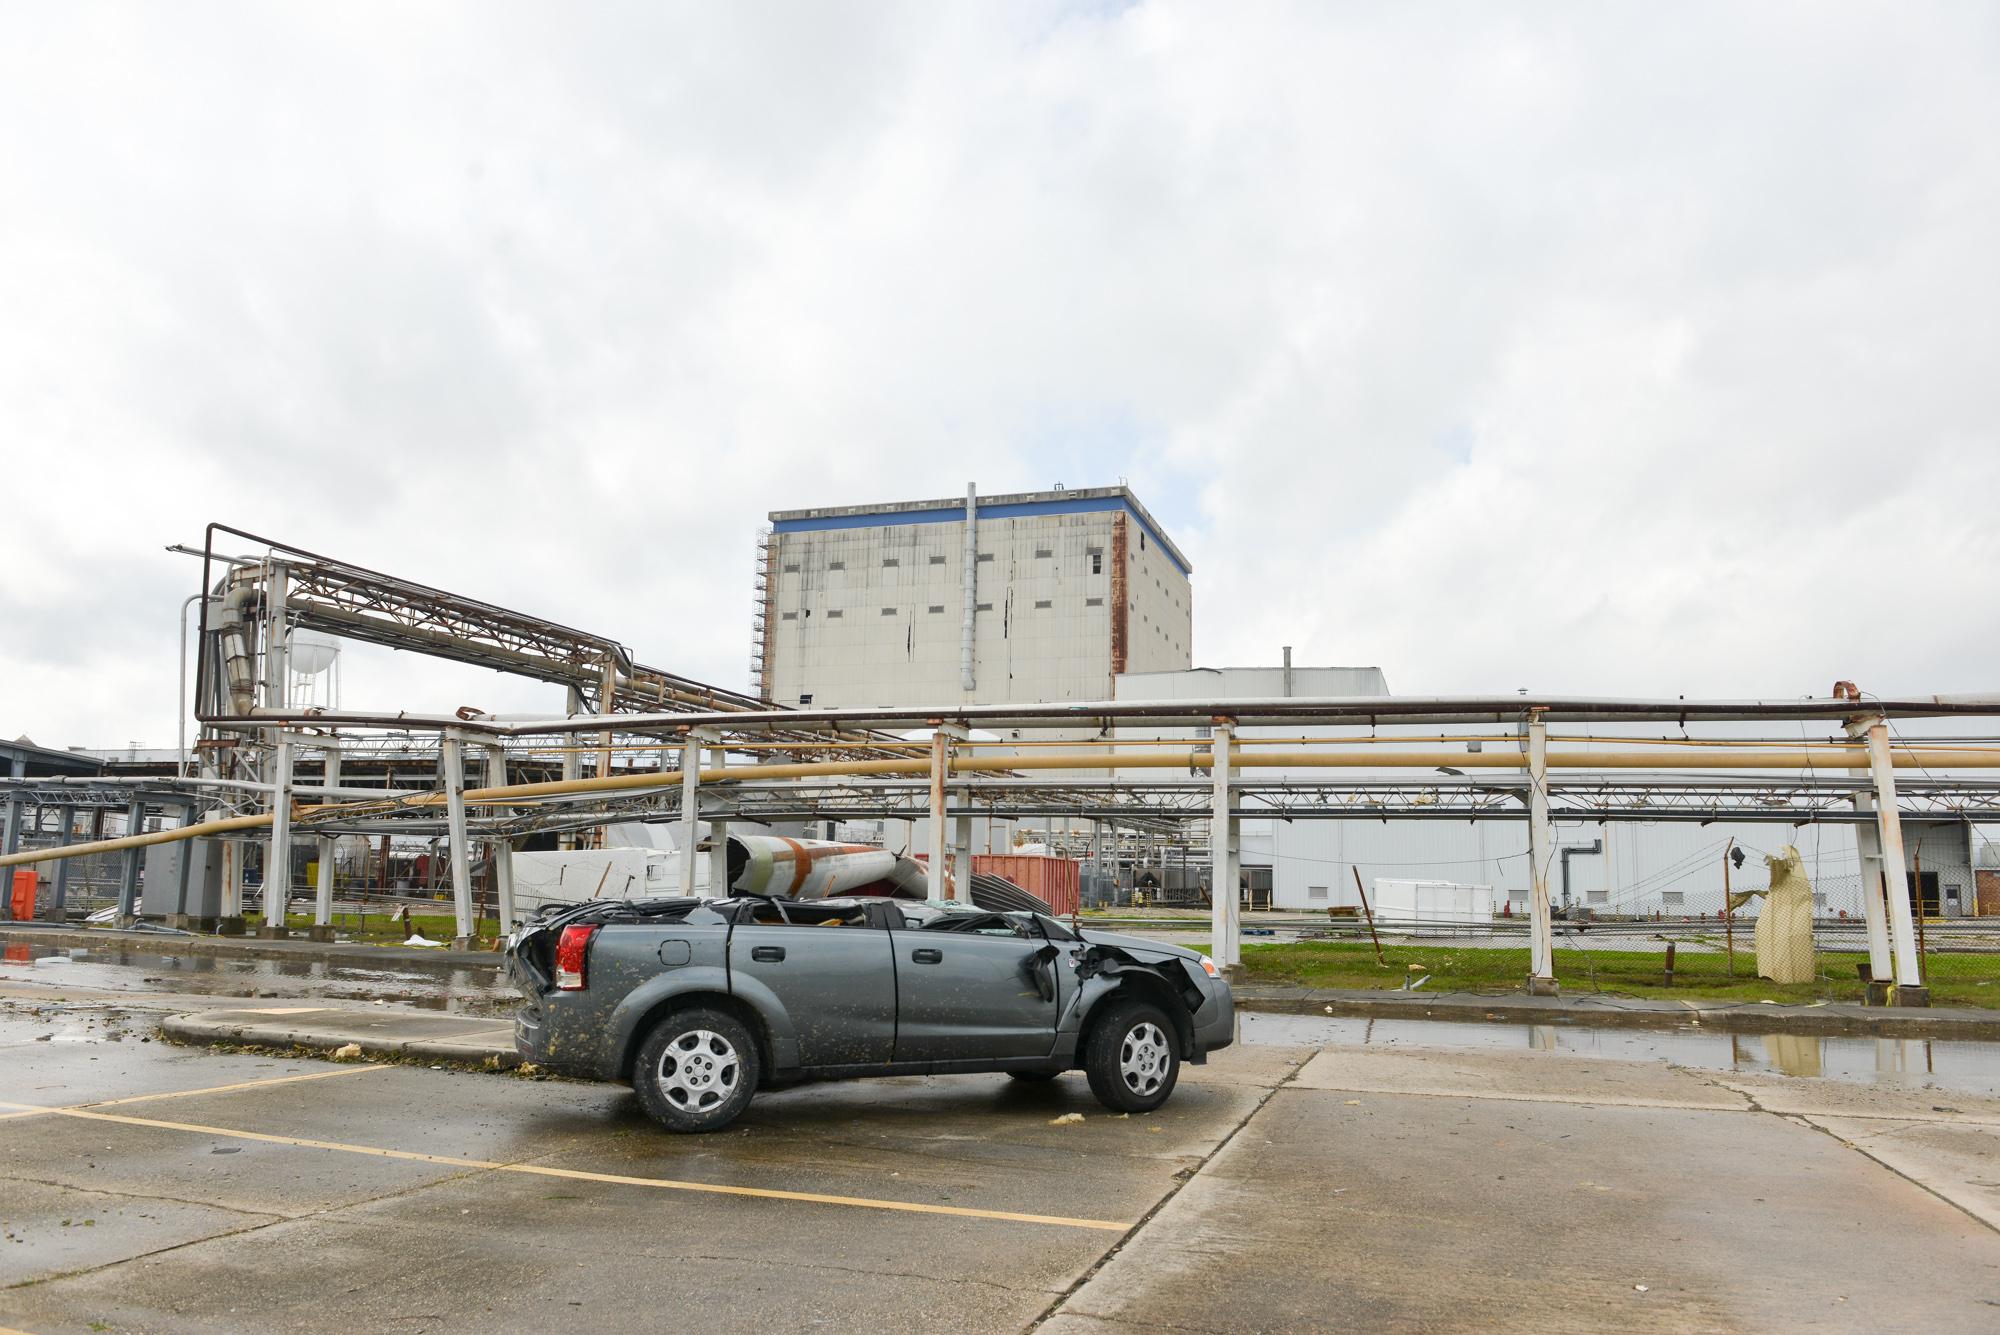 tornado damages nasa facility in new orleans the verge damage to external tank seen behind a parked car at michoud photo nasa